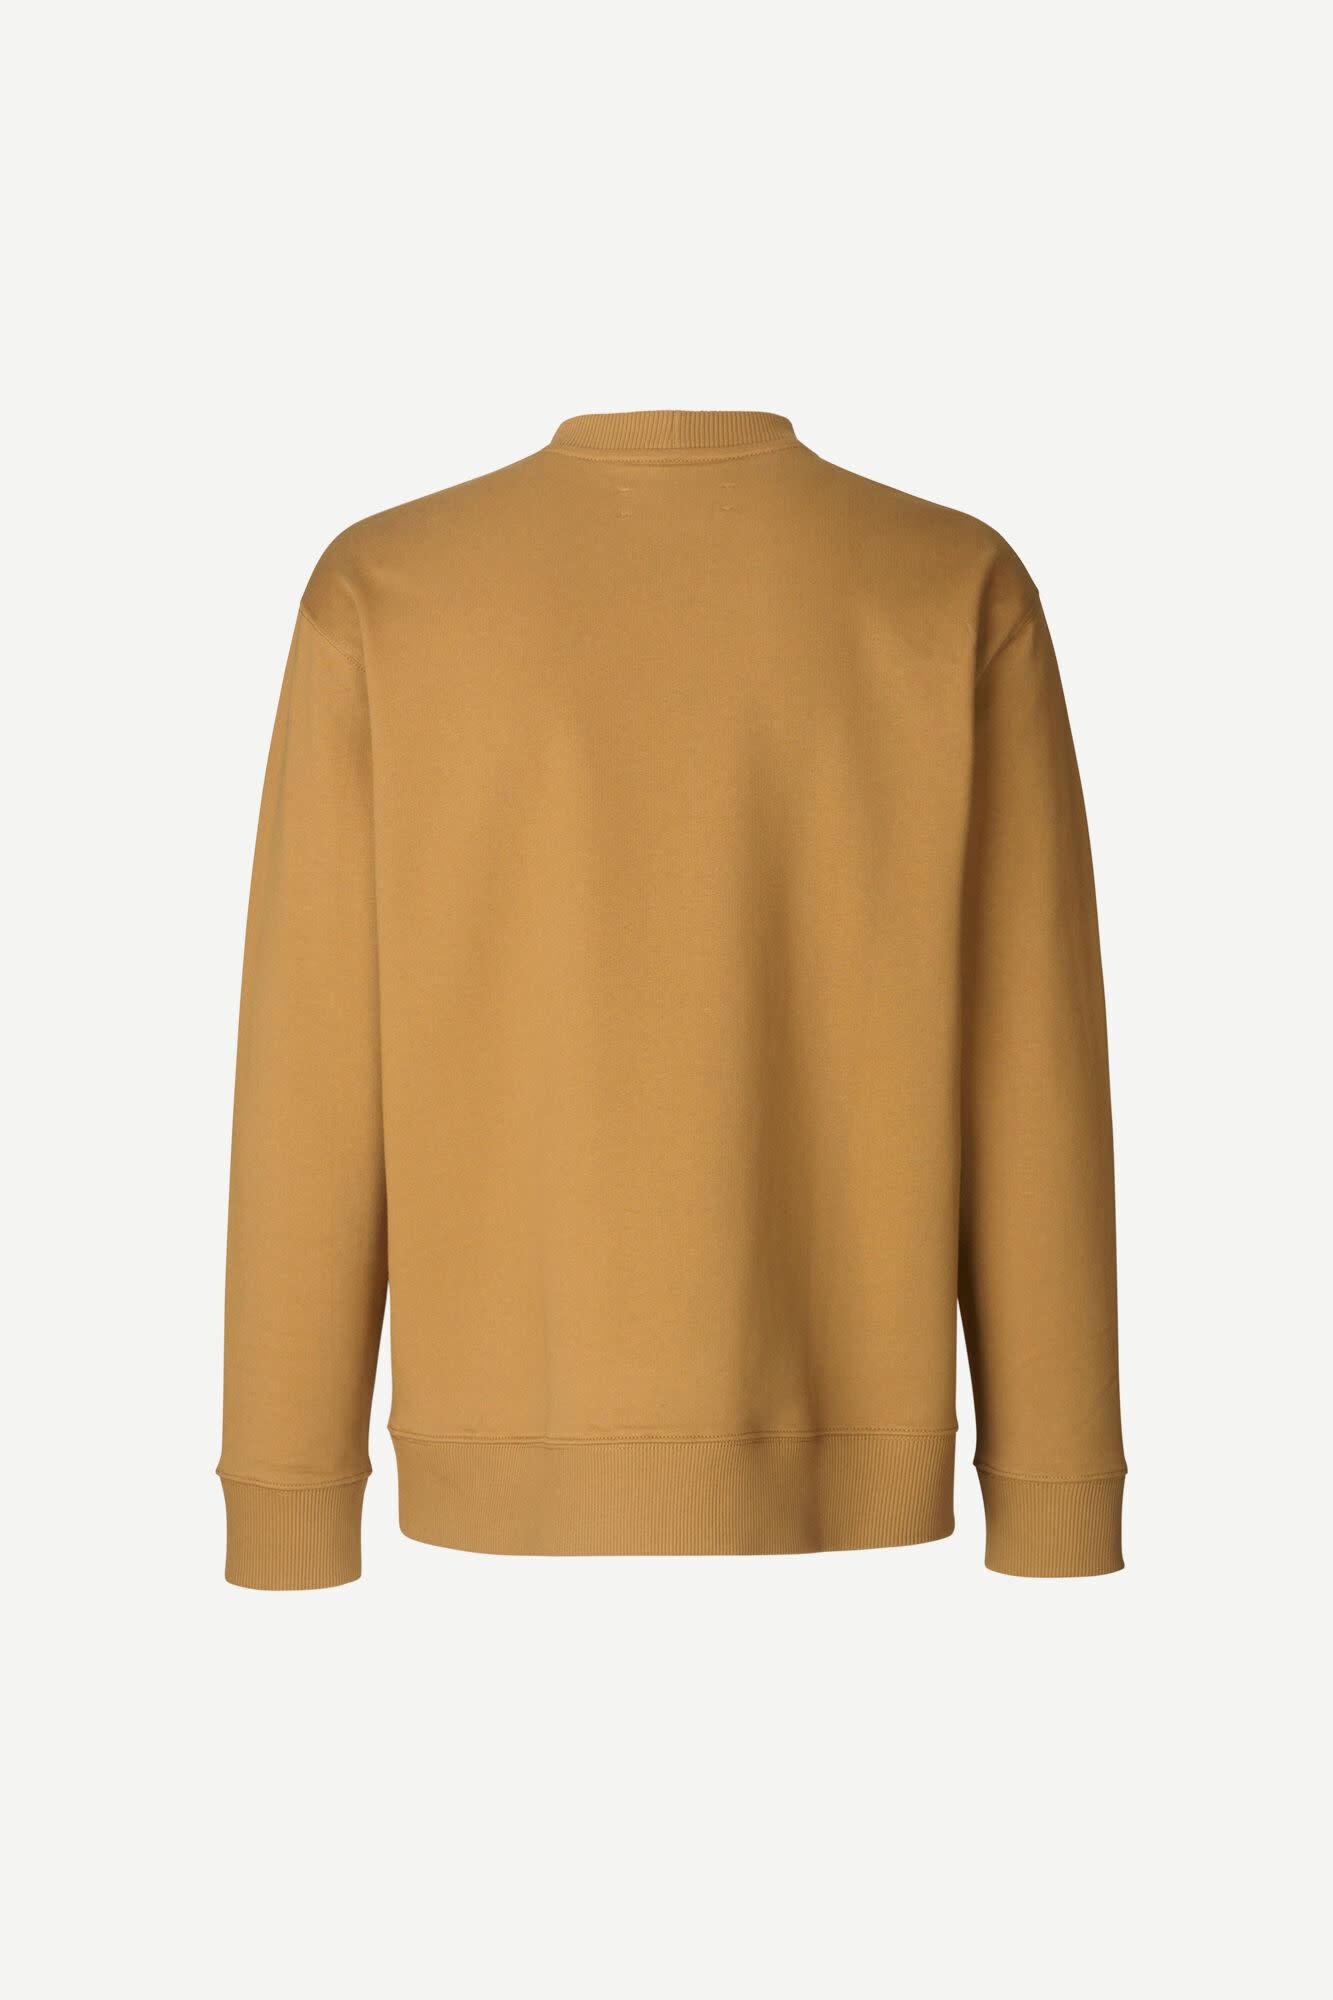 Toscan Sweatshirt Cumin Brown 11414-2